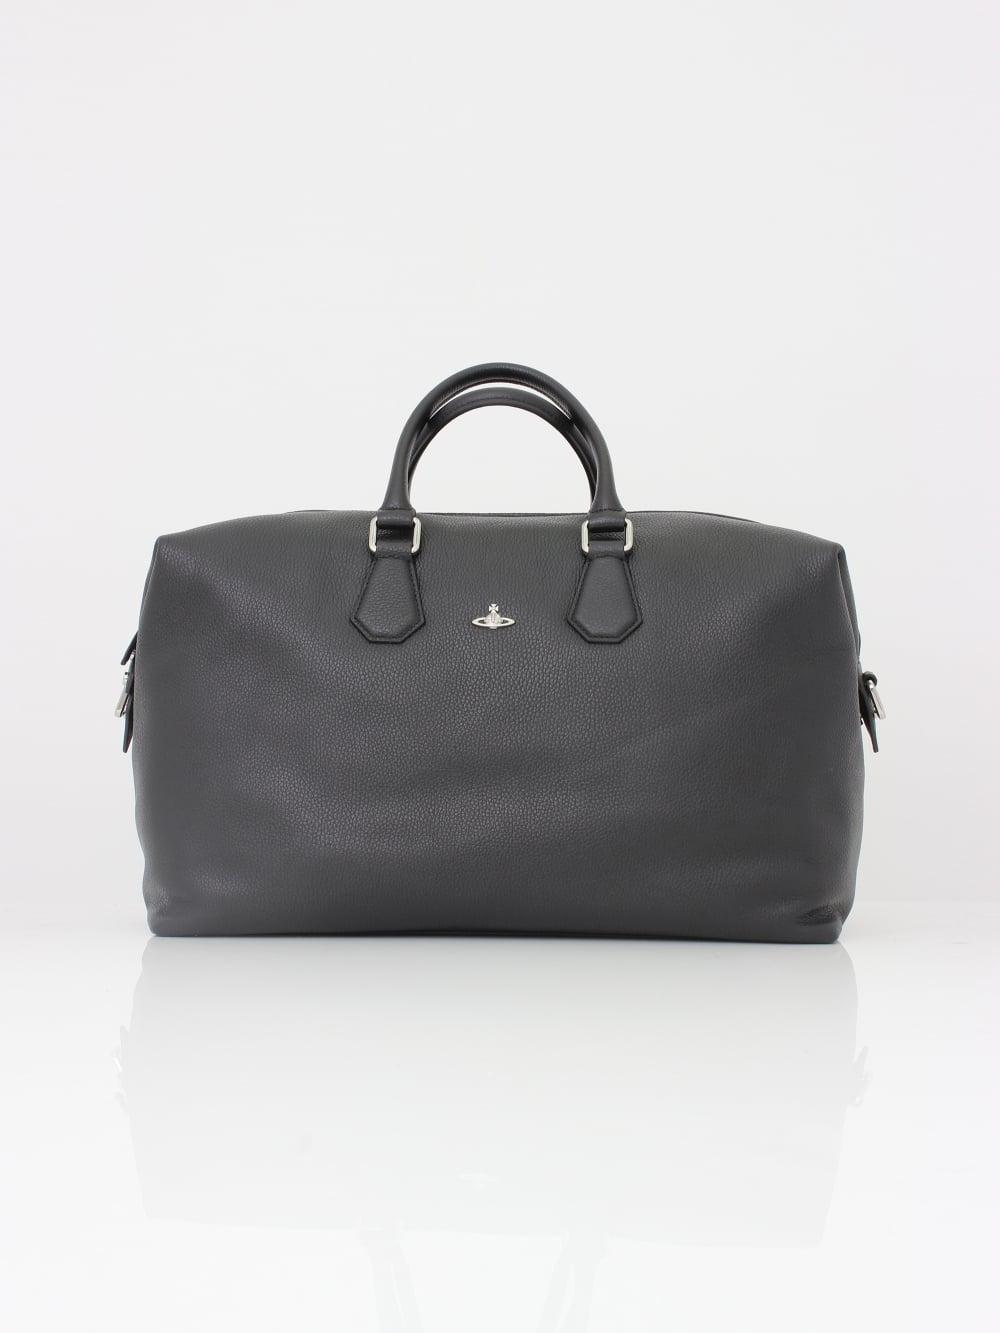 a77d4198cb Vivienne Westwood Milano Weekender Bag in Black - Northern Threads